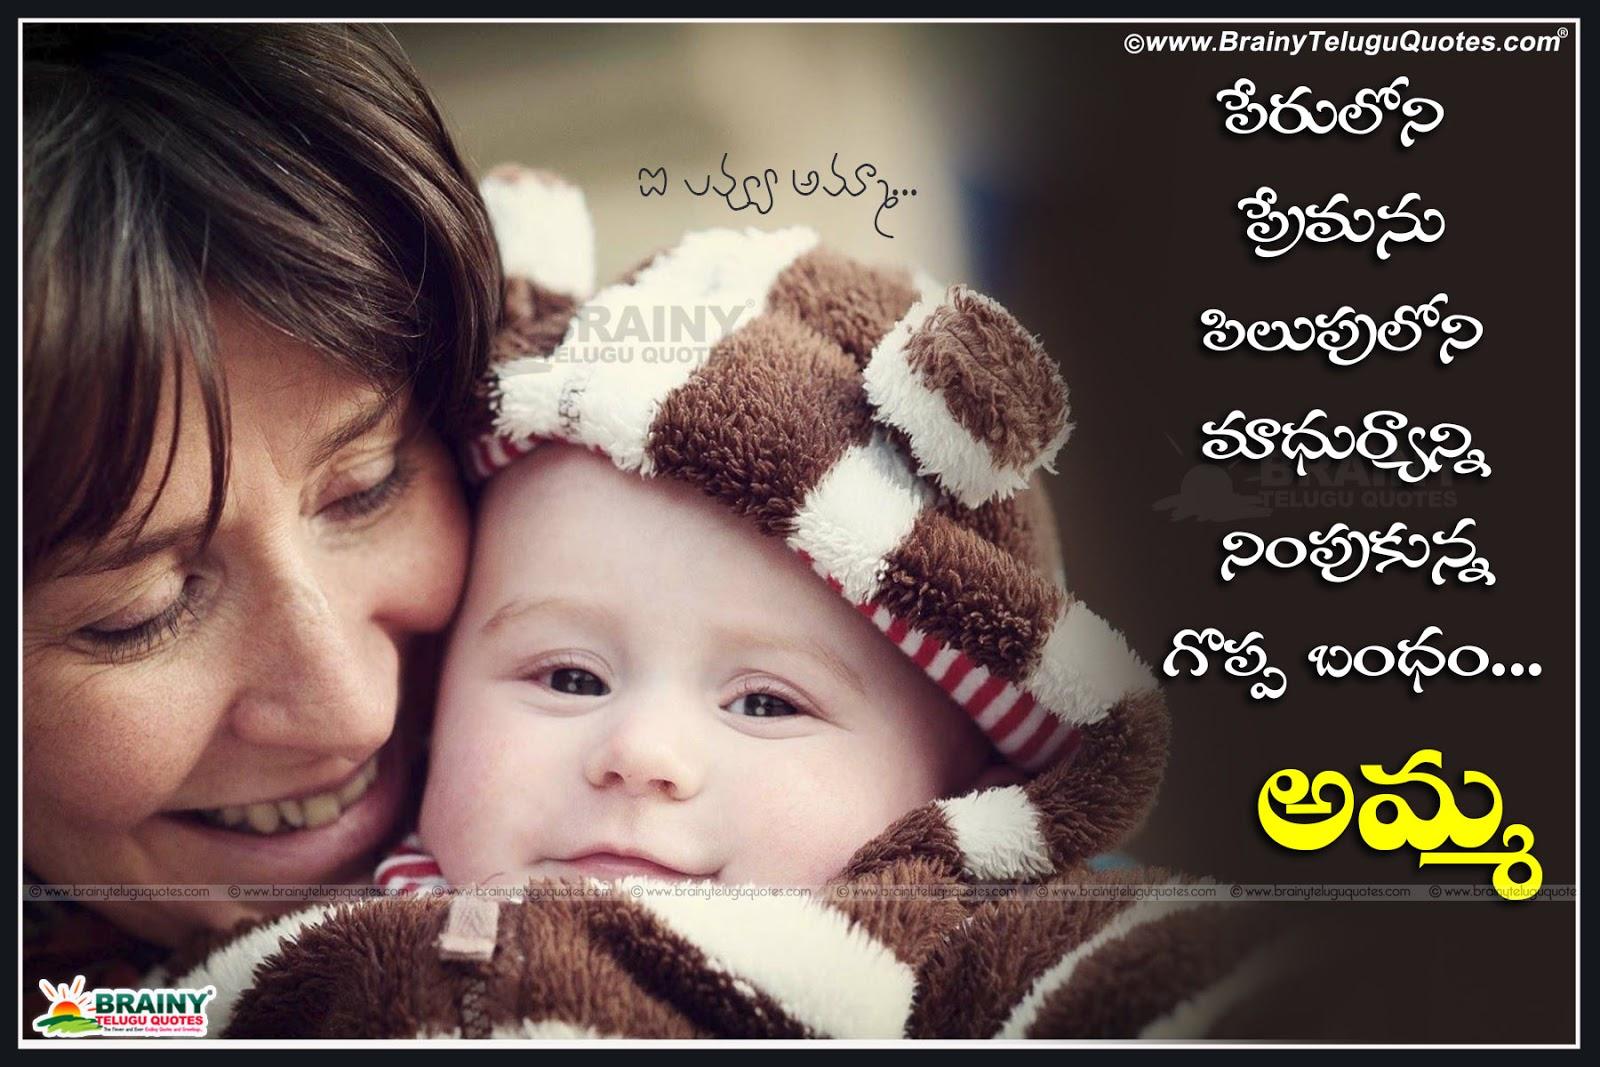 Famous Telugu Amma Quotations Mother Sayings In Telugu